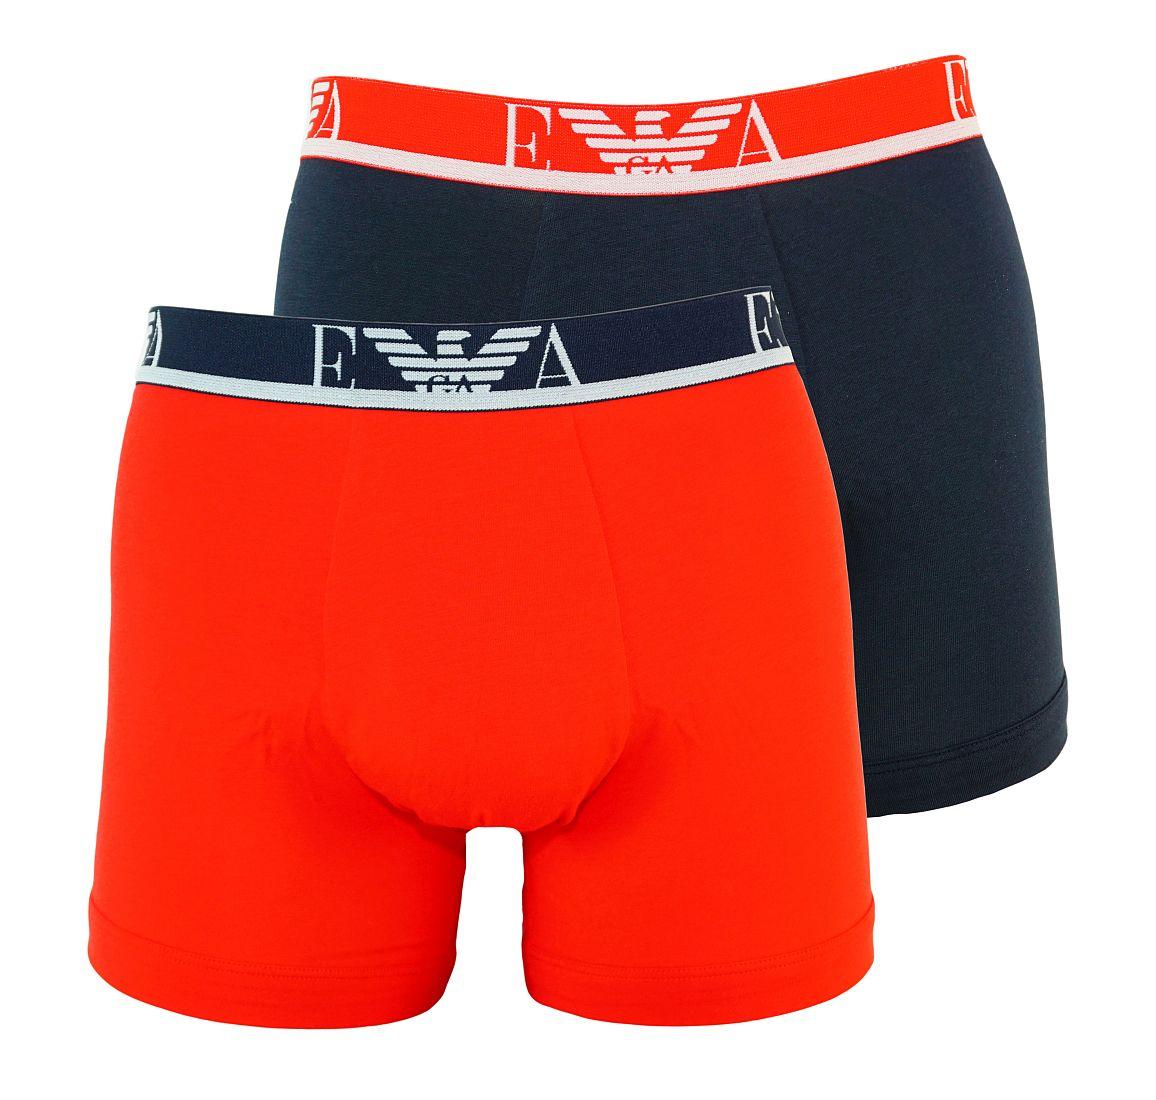 Emporio Armani 2er Pack Boxershorts Unterhosen ROSSO/MARINE 111268 7P715 09674 WF17-EAB1